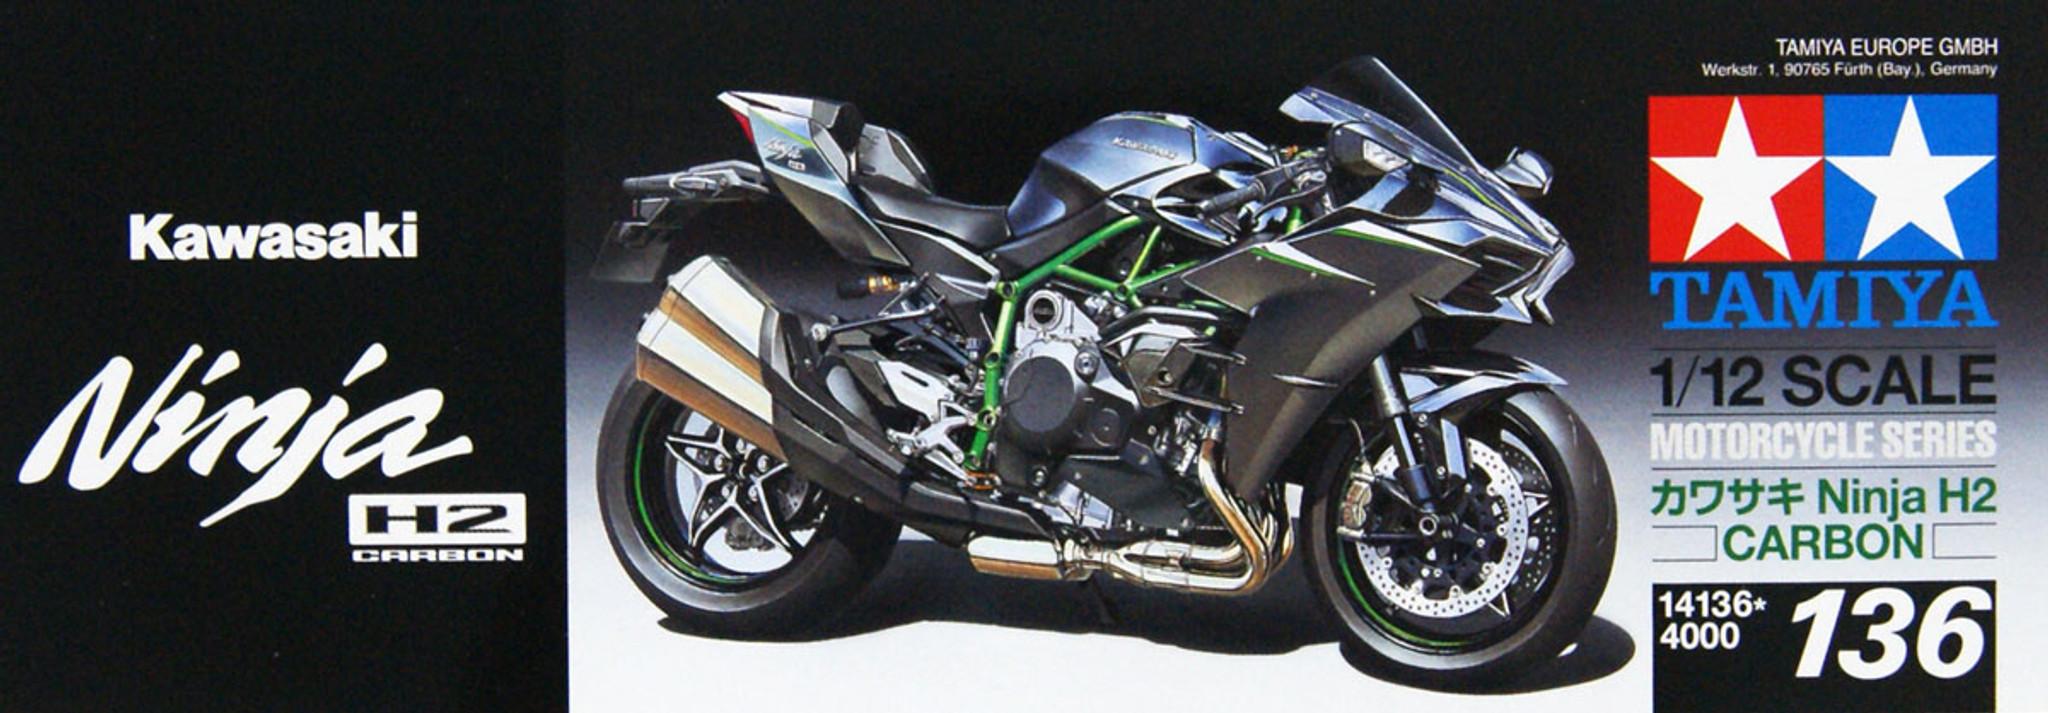 Tamiya 14136 Kawasaki Ninja H2 Carbon 1/12 scal | PlazaJapan